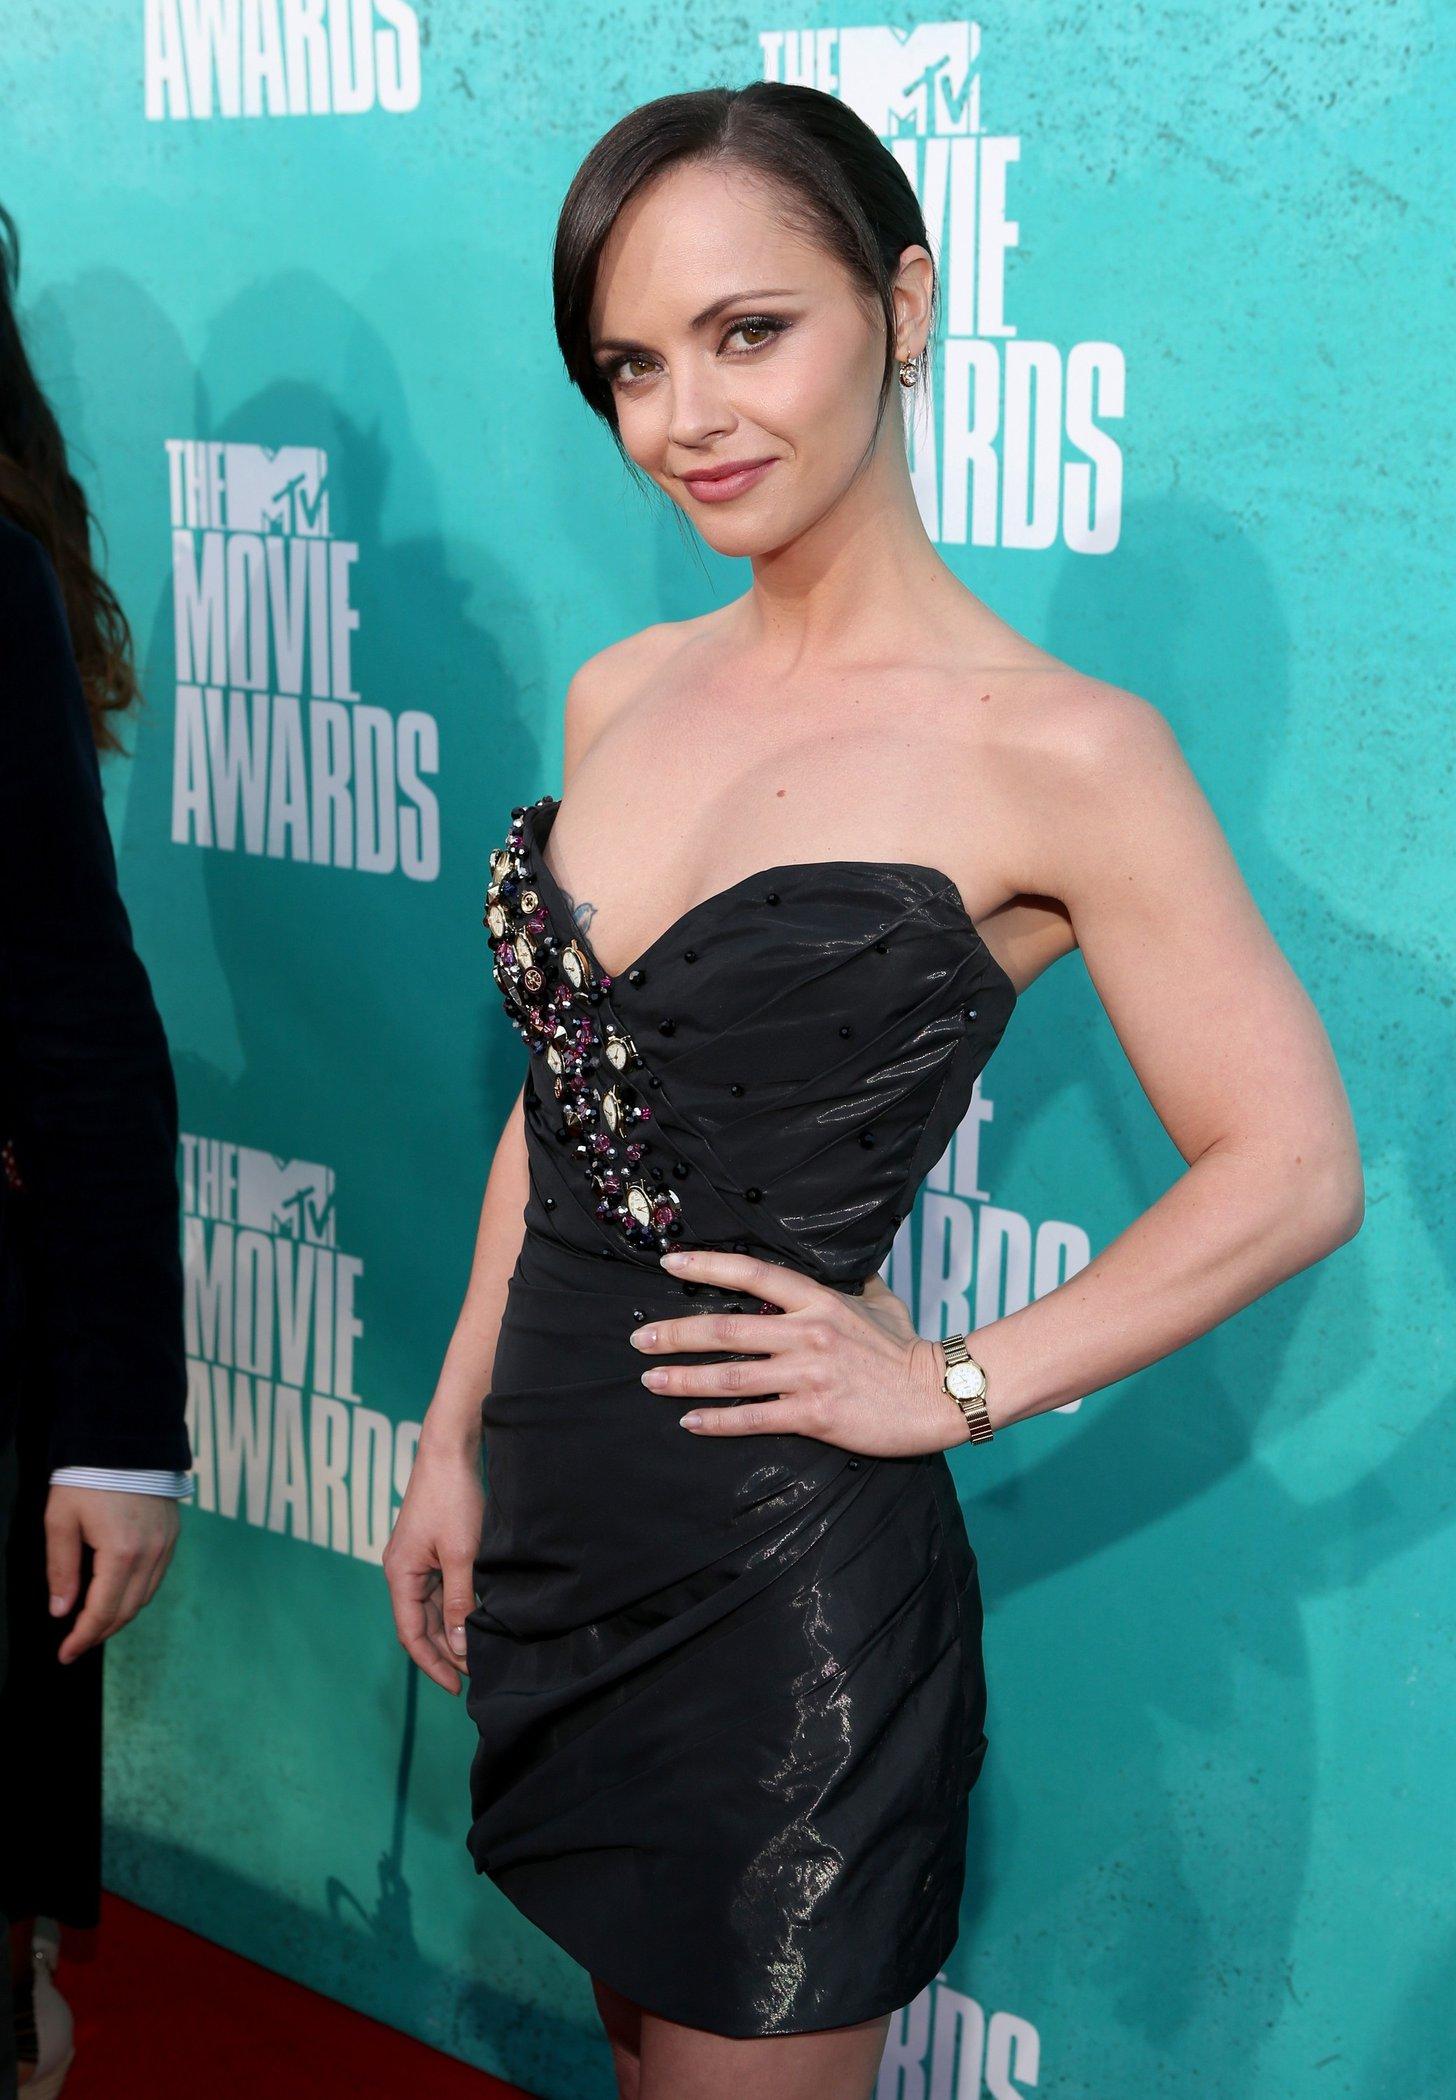 Christina Ricci at 2012 MTV Movie Awards, Los Angeles, June 3, 2012